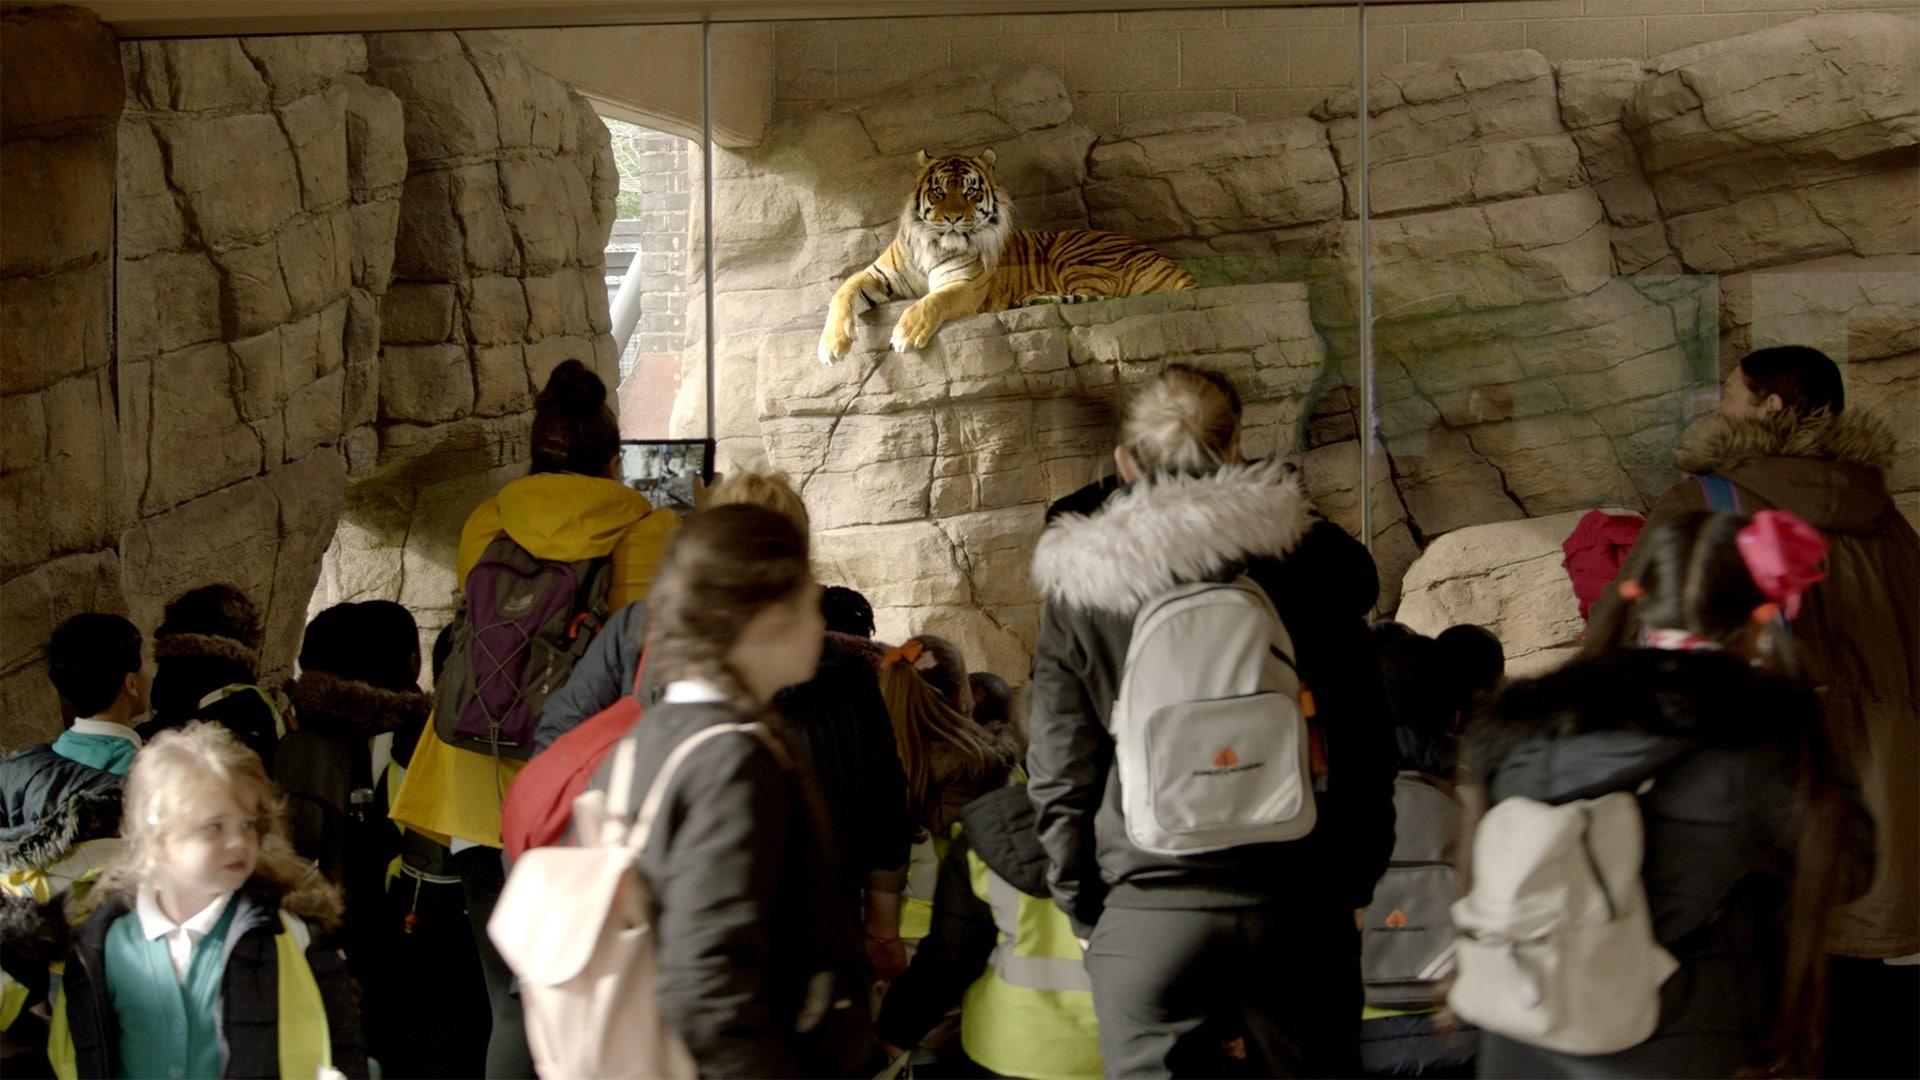 27_Film Still_London Zoo